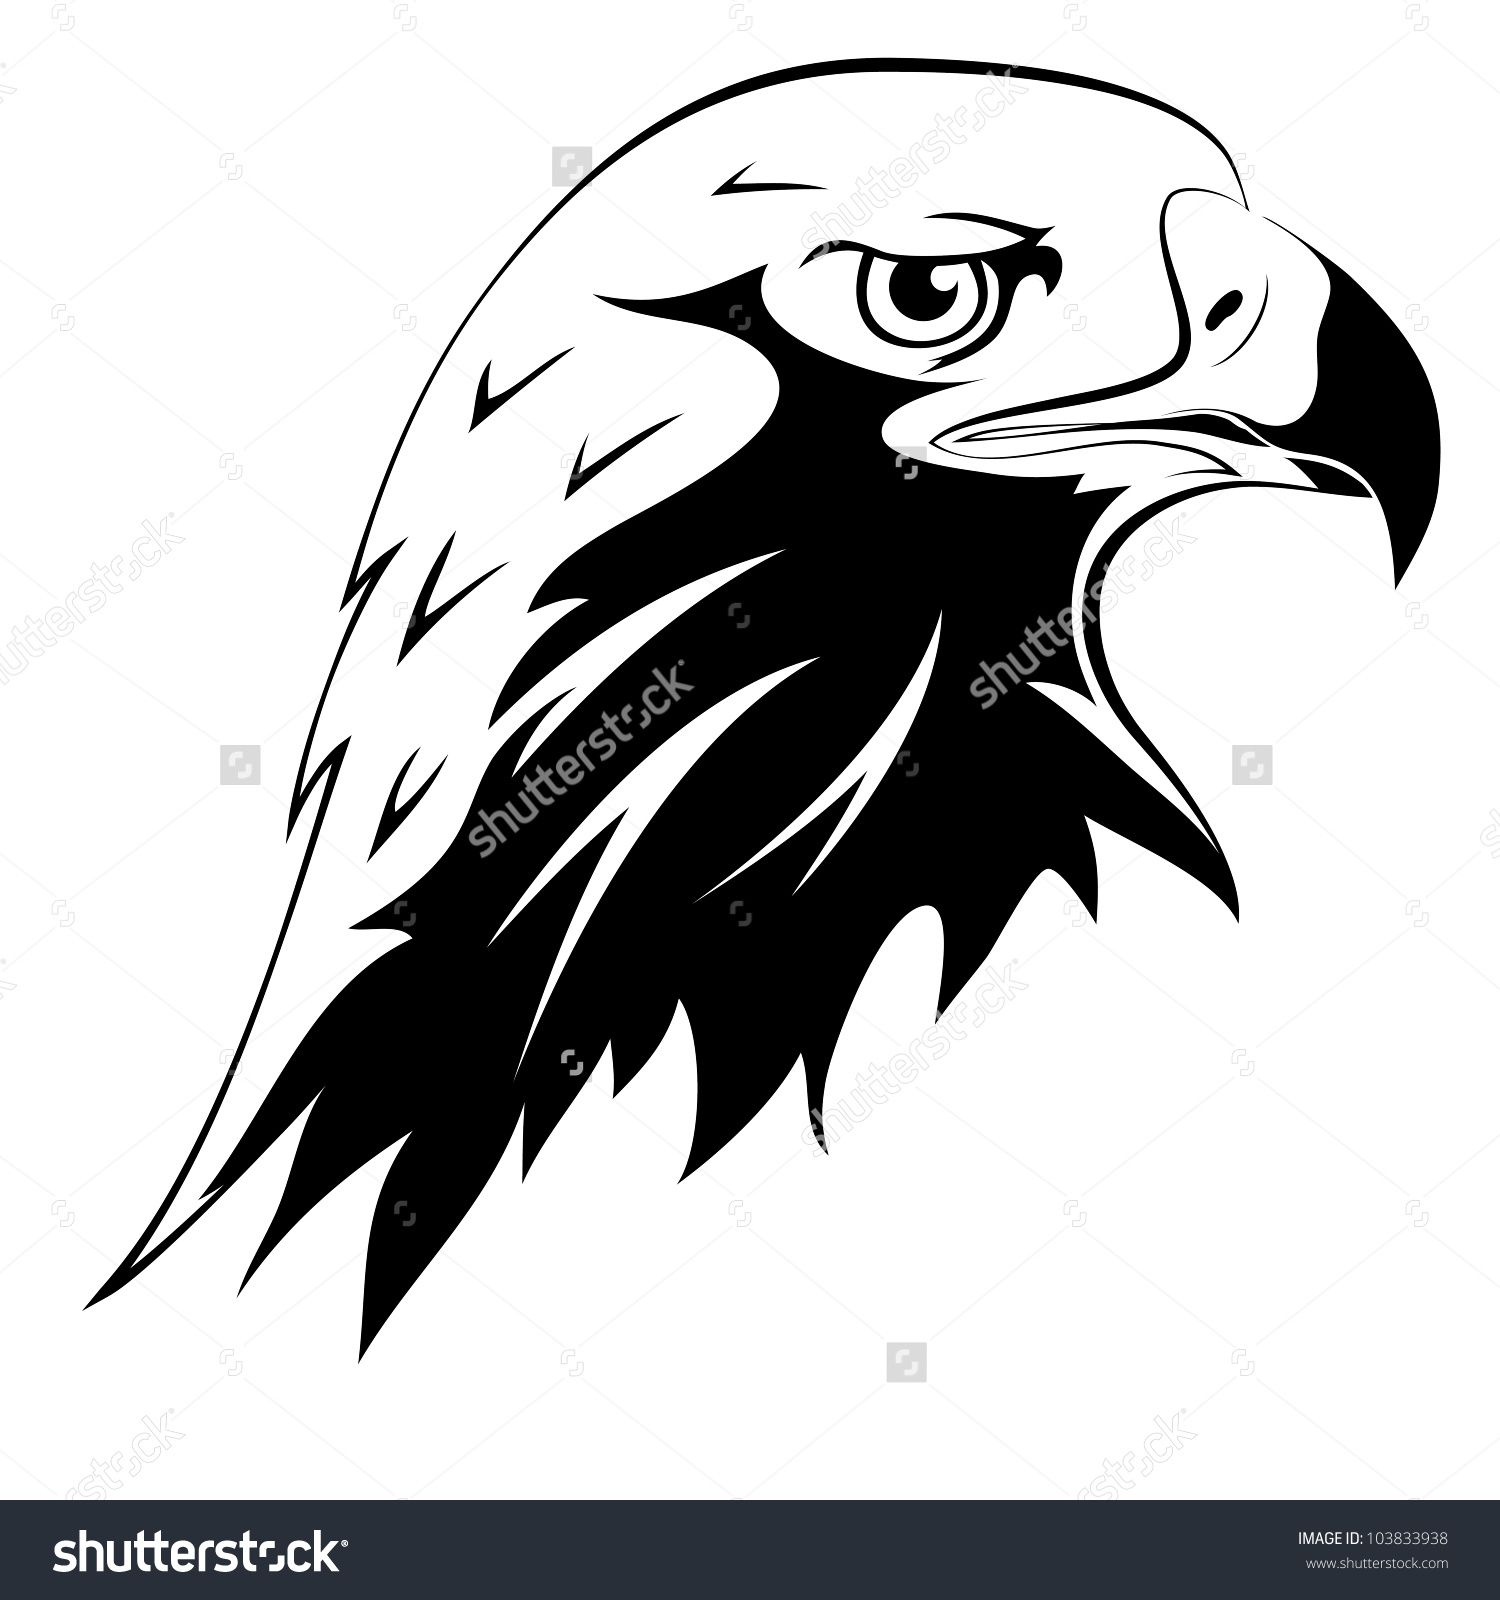 Falcon clipart outline. Head a wild predator